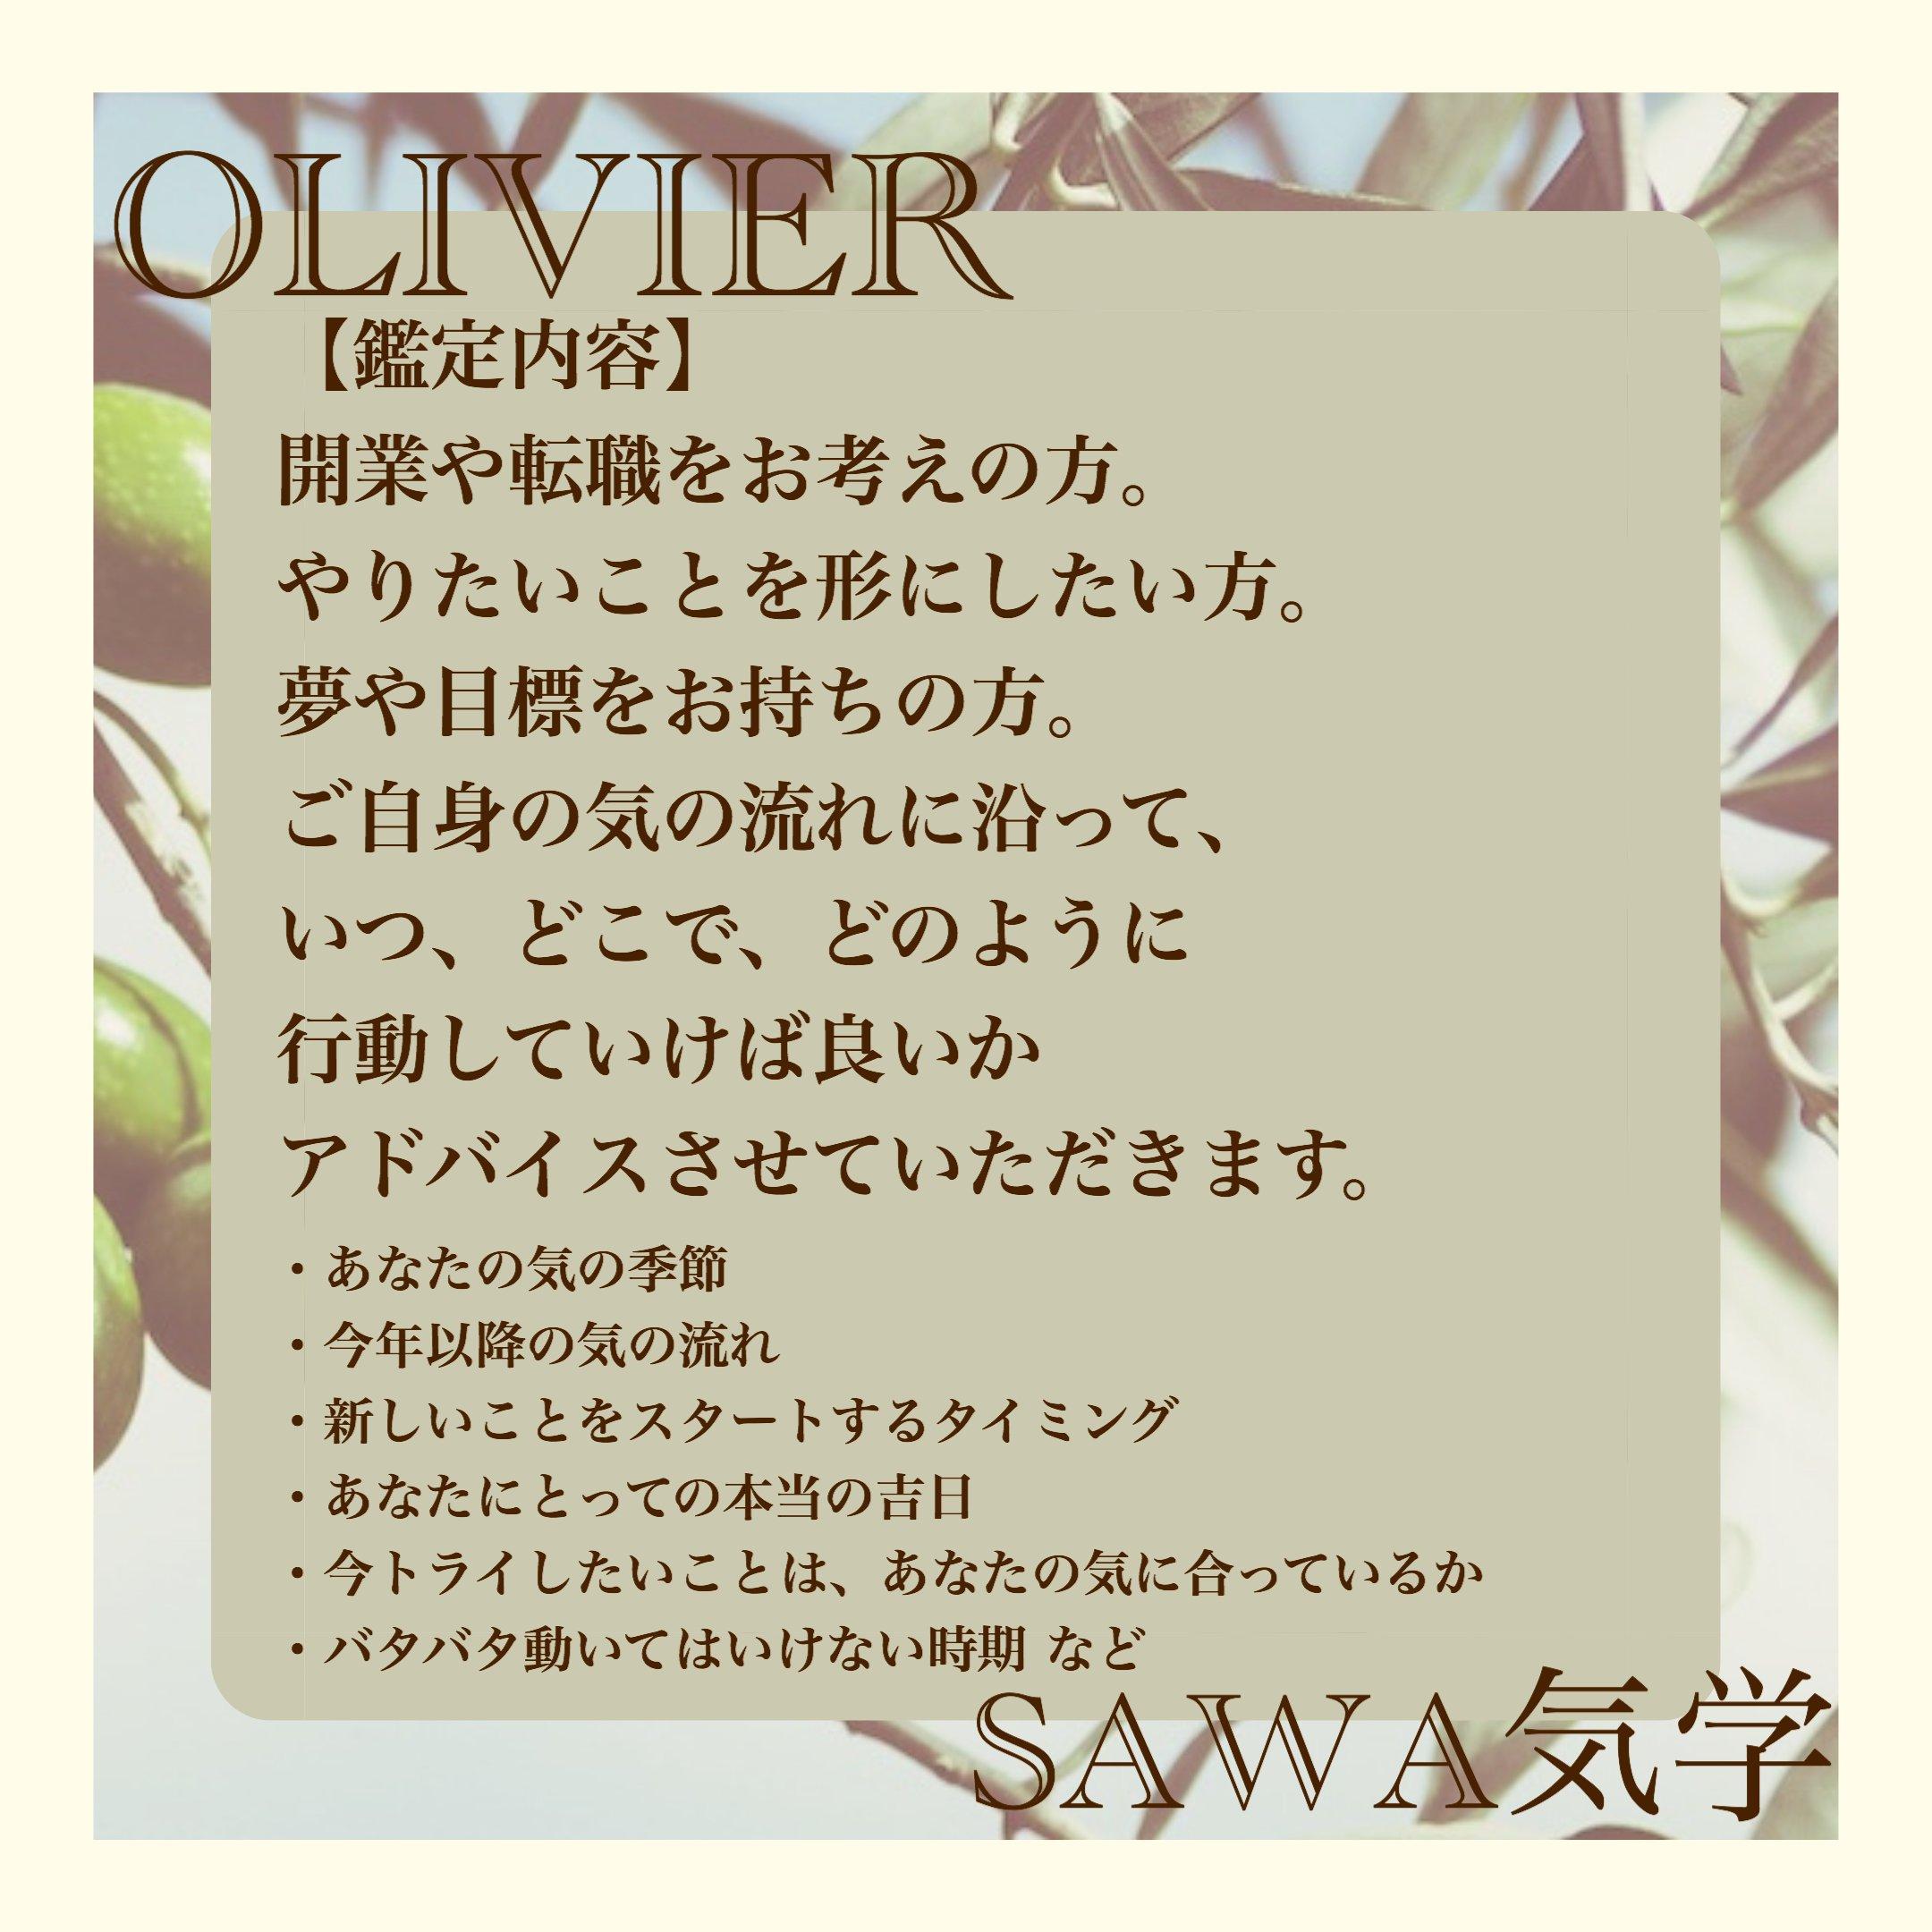 SAWA気学オンライン鑑定60分〜【開運】天の流れに乗る人生の戦術〜のイメージその3